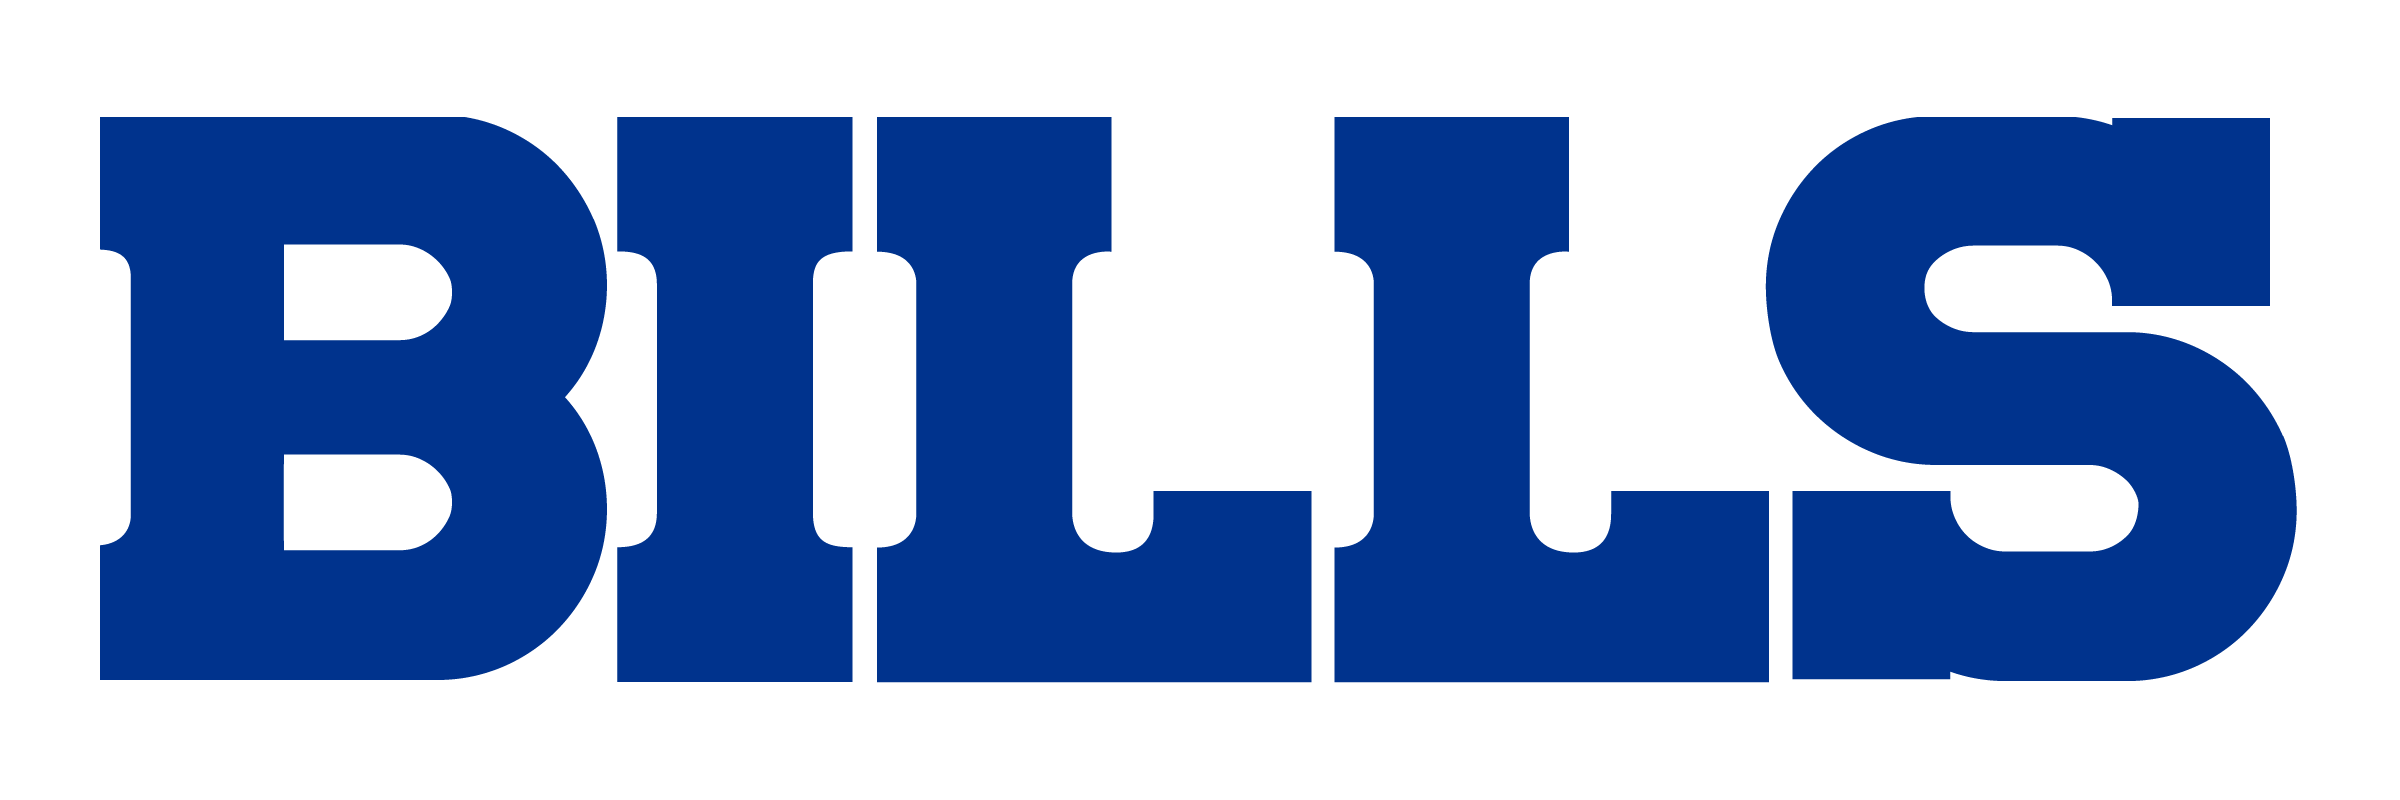 Buffalo Bills PNG - 97852